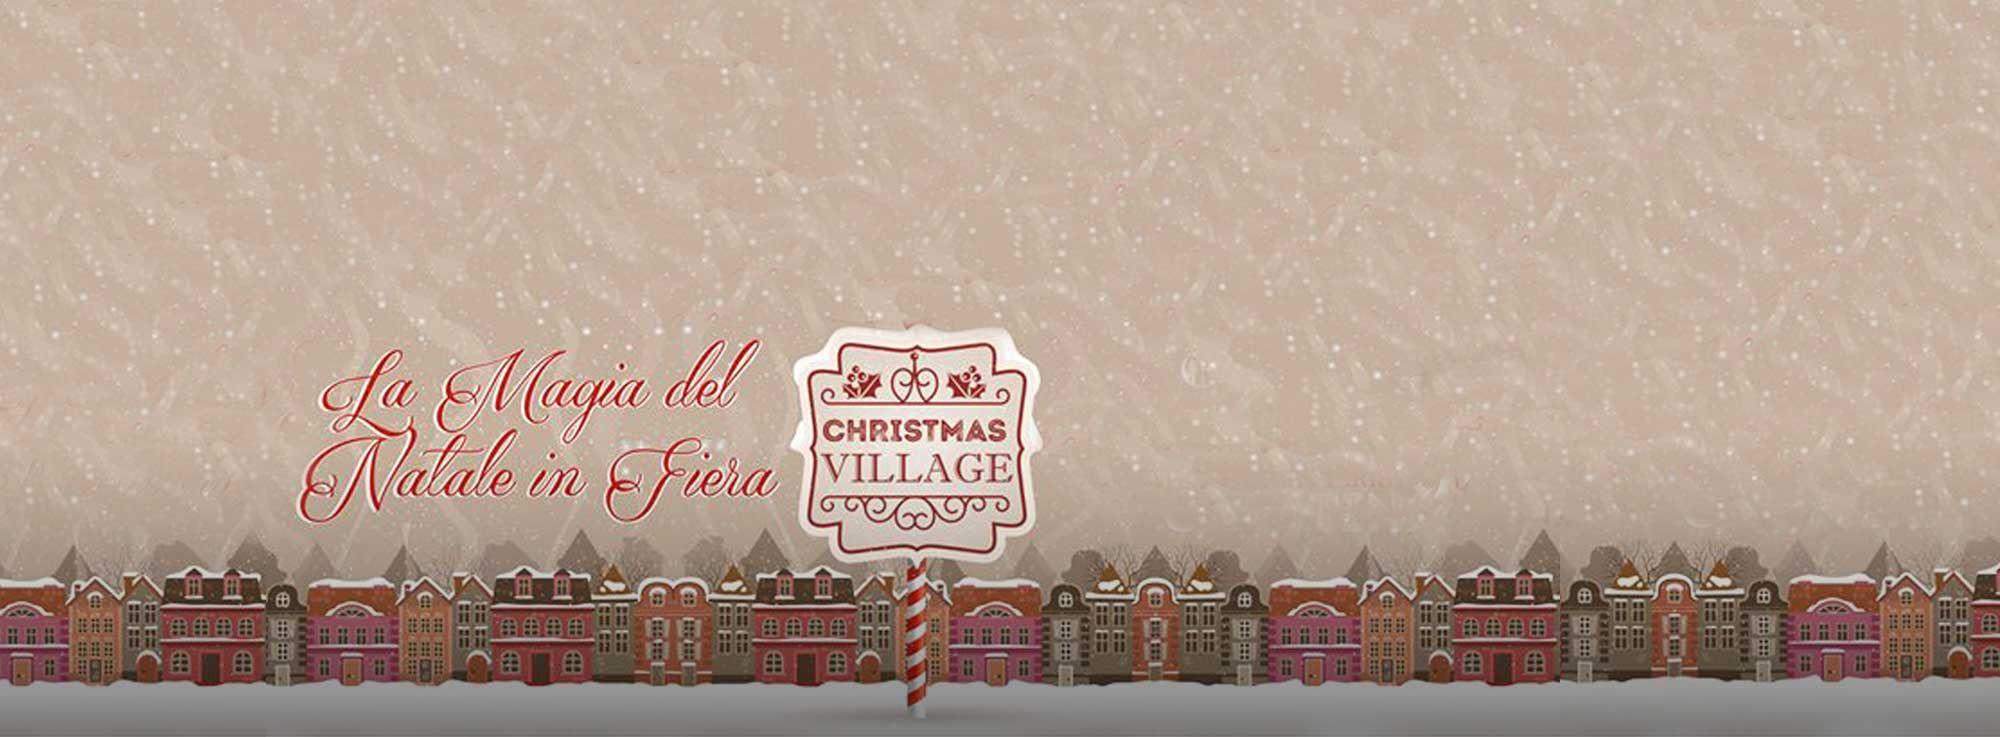 Galatina: Christmas Village